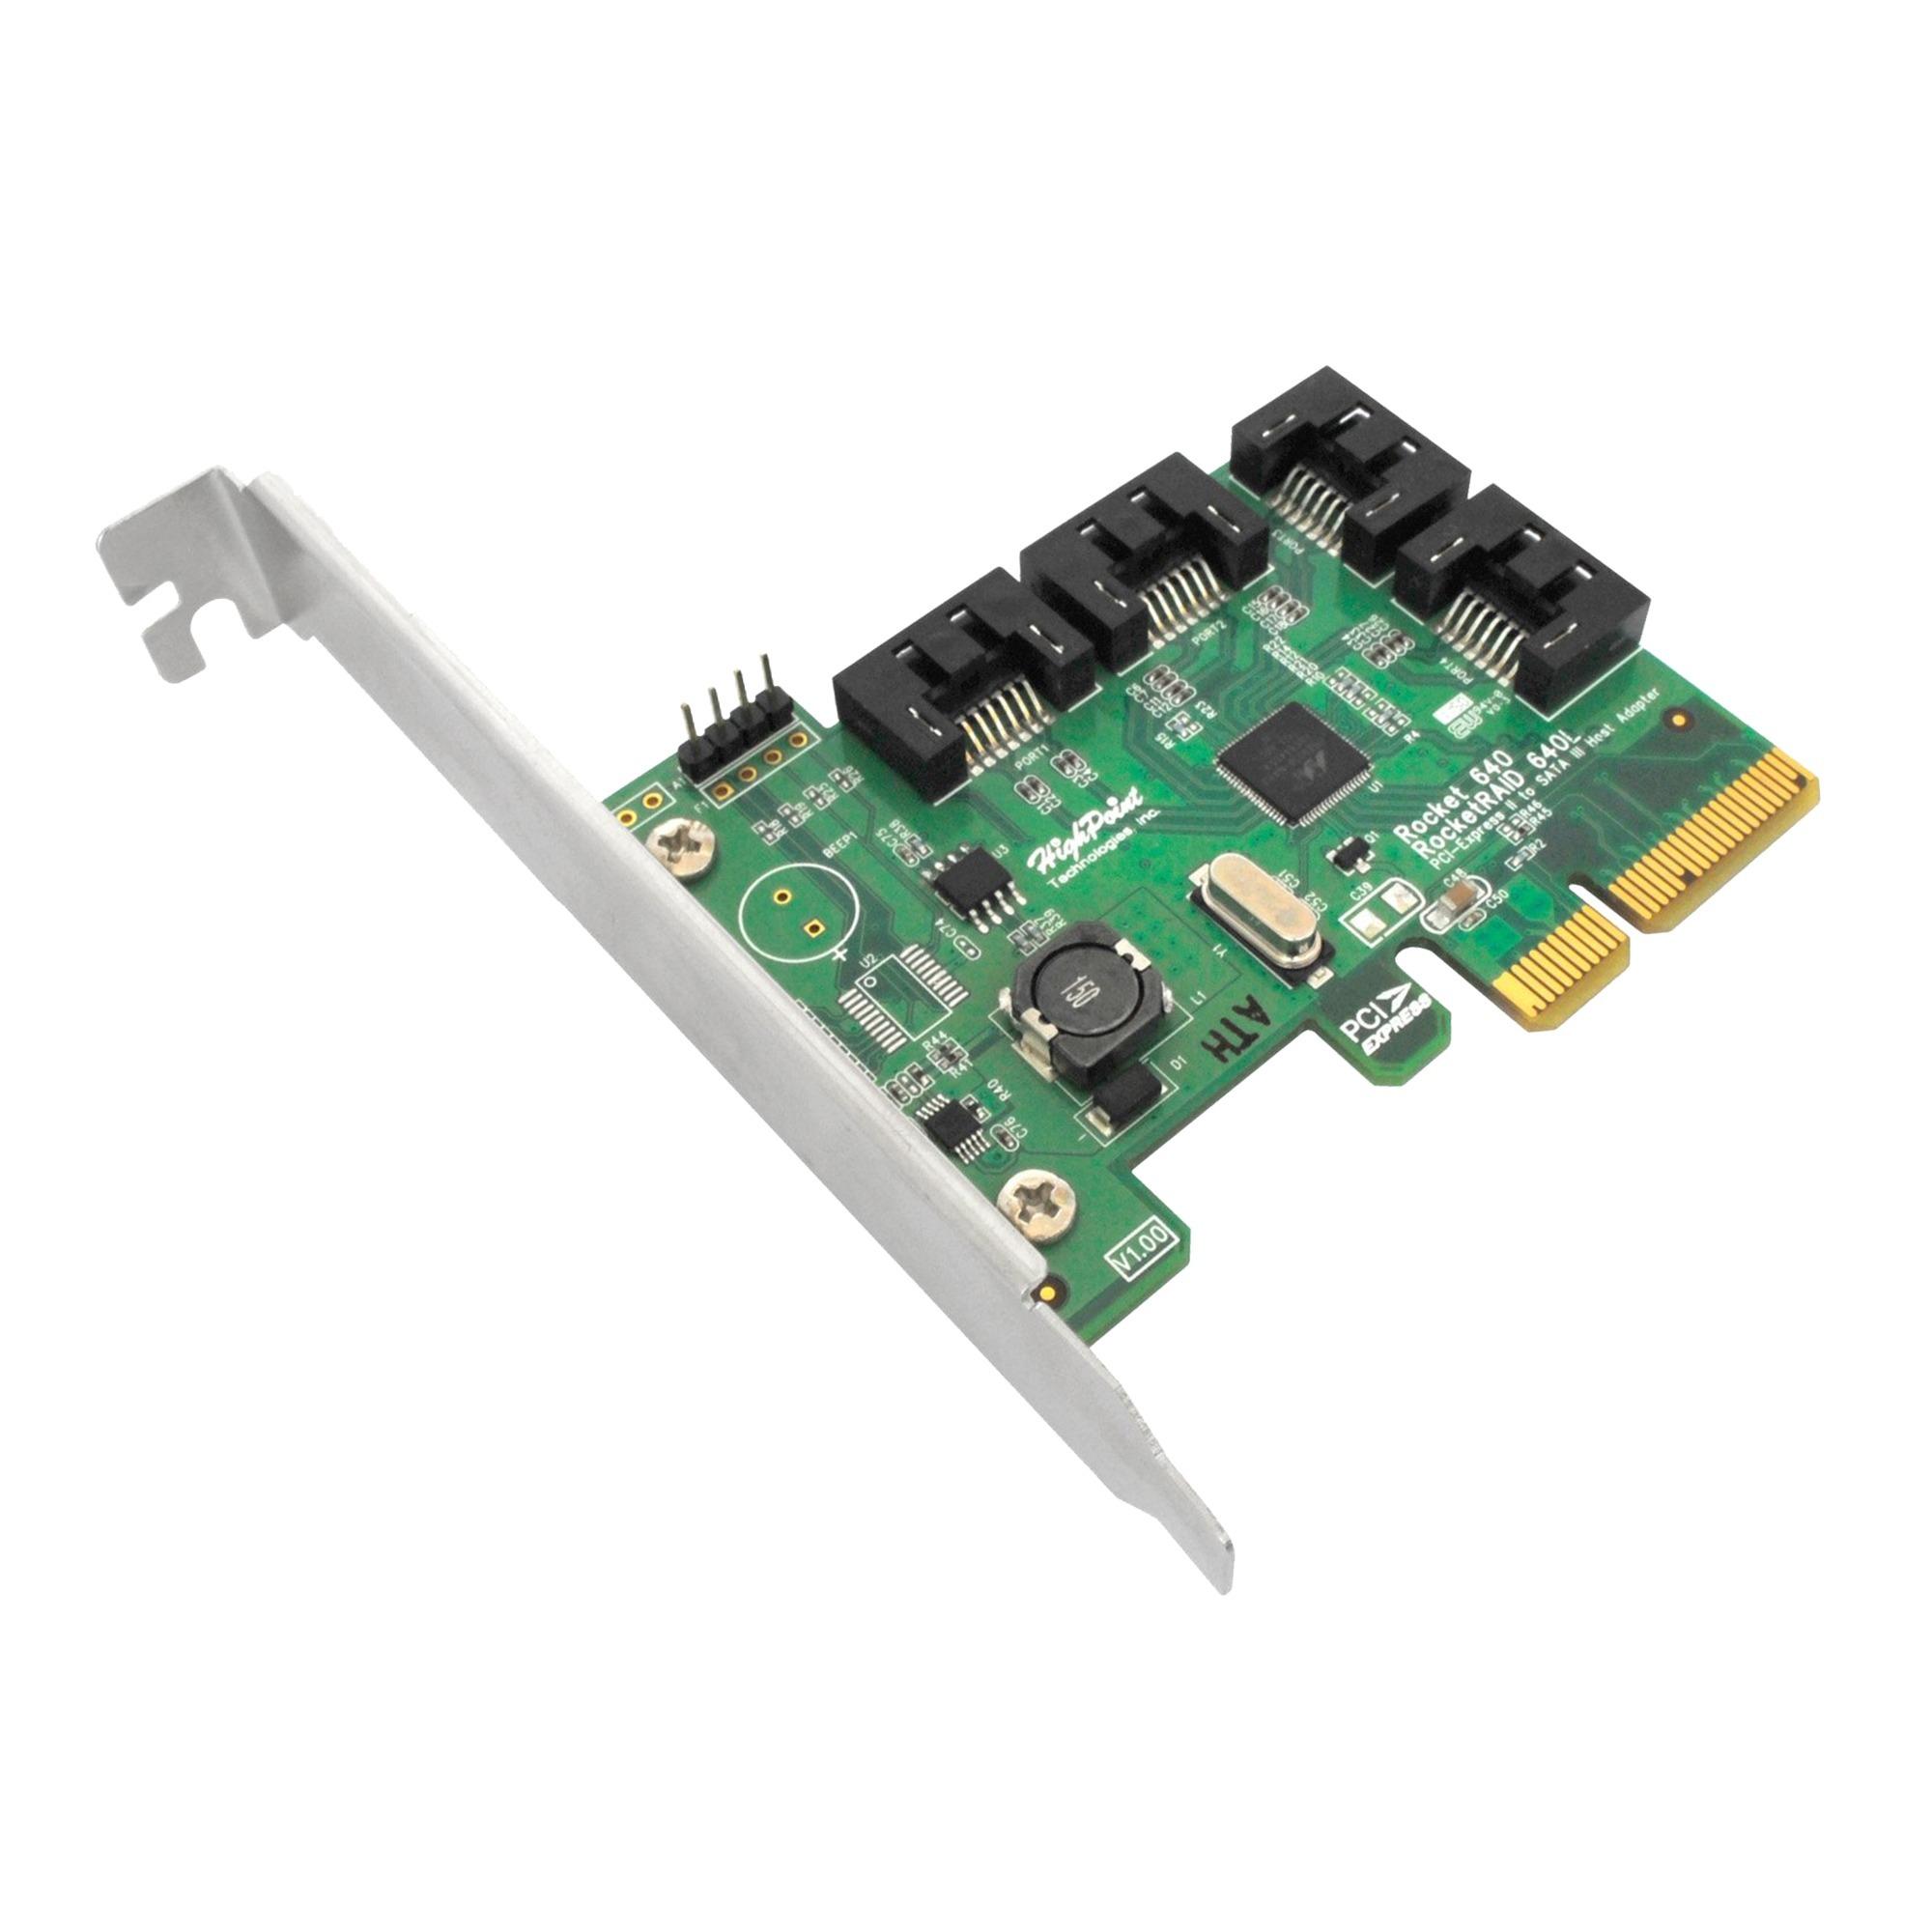 rocket-640l-intern-sata-interface-kort-og-adapter-controller